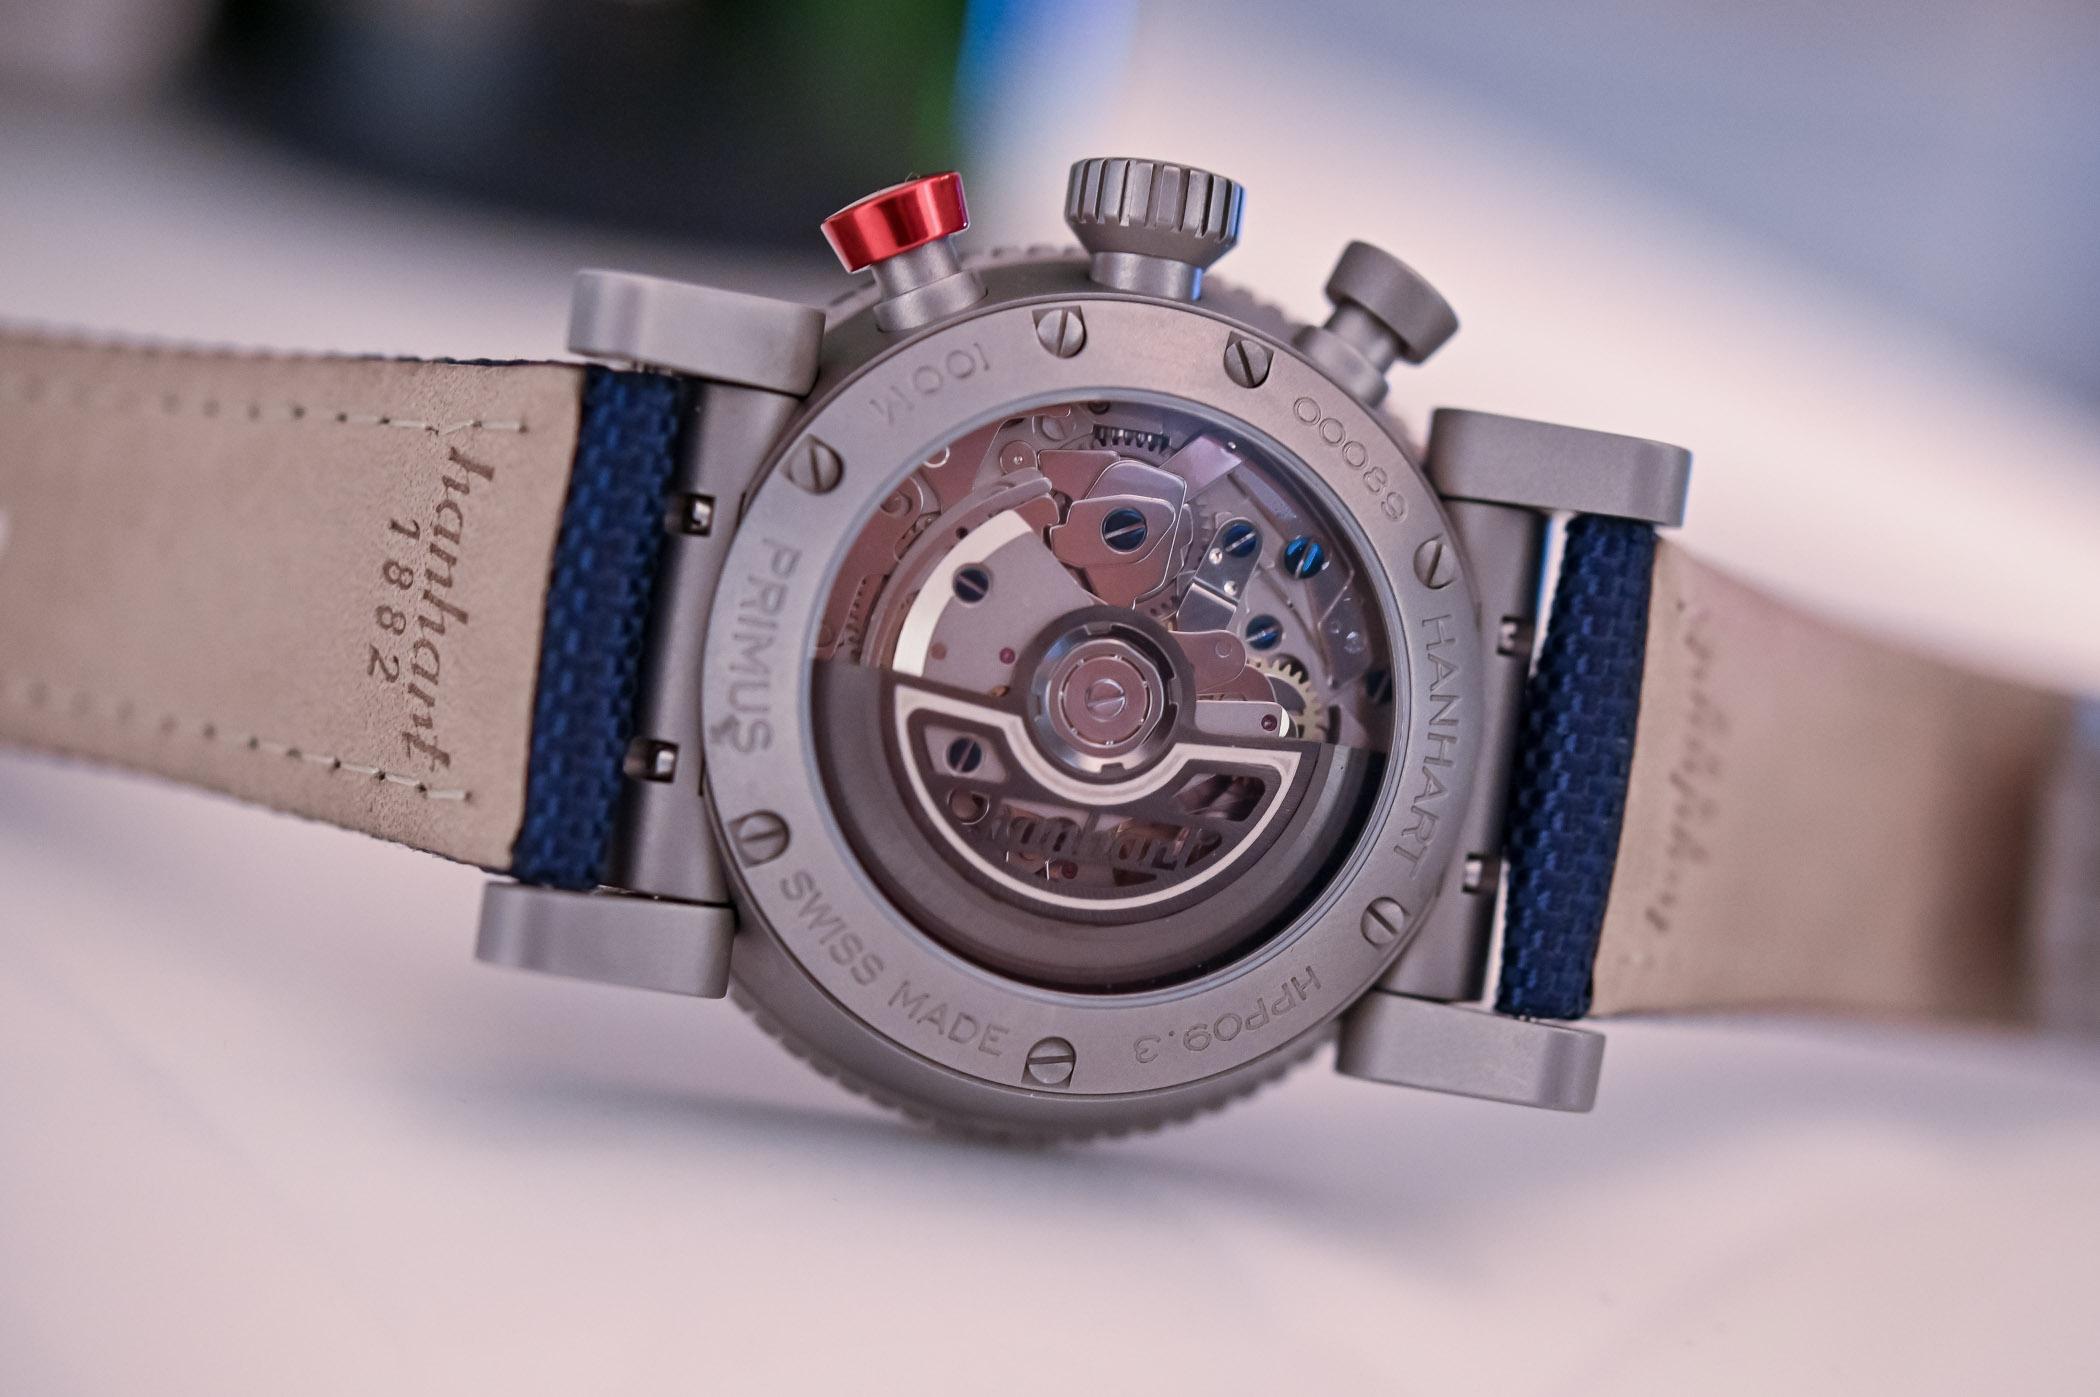 Hanhart Primus Carrier Pilot Chronograph